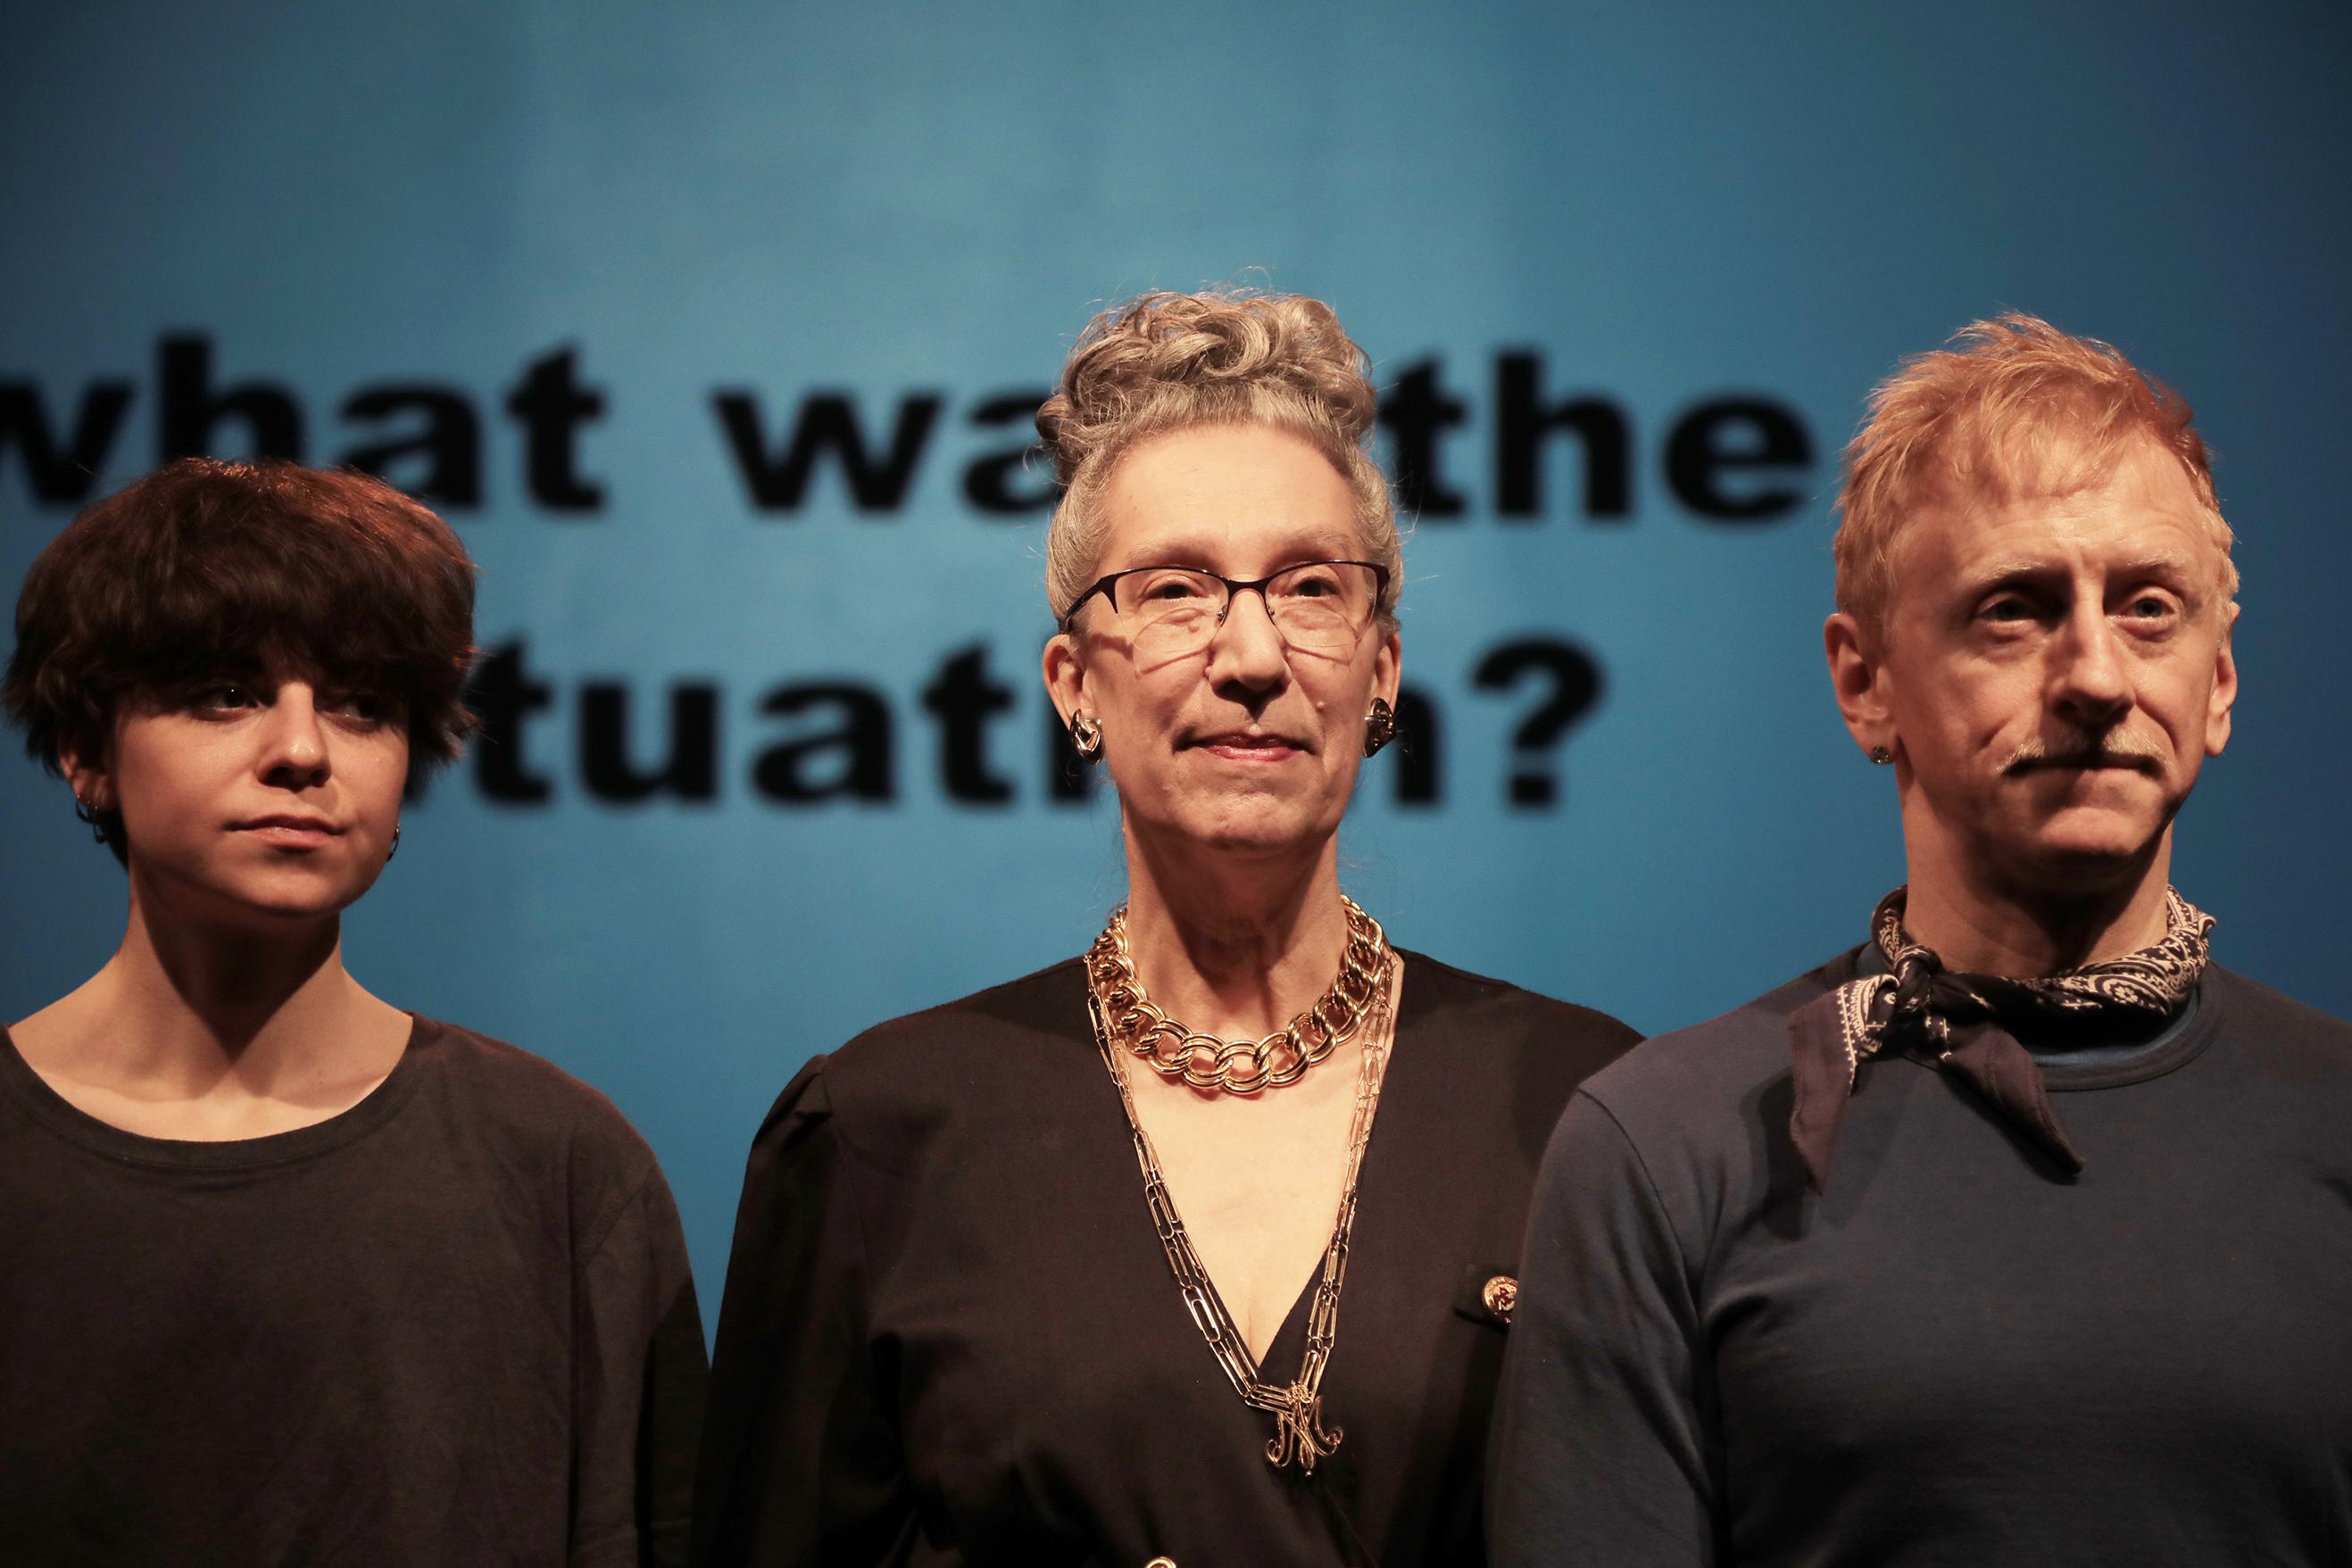 three people standing onstage